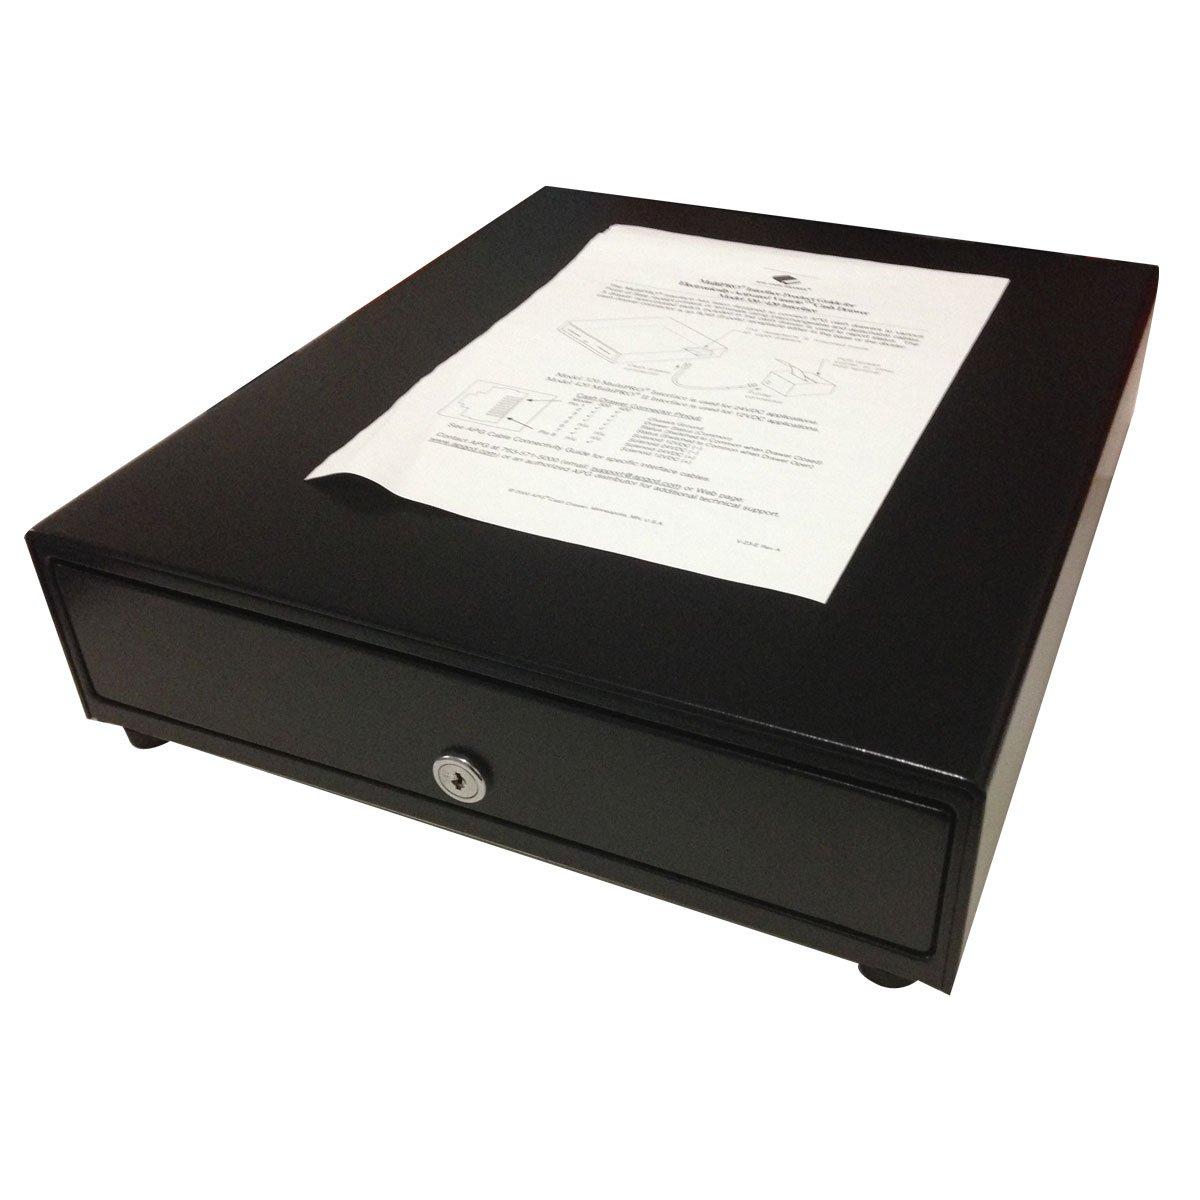 APG Cash Drawer VP320-BL1416-B4 Acero inoxidable Negro bandeja para cajón portamonedas - Bandejas para cajones portamonedas (351 mm, 415 mm, 102 mm, 1000000 operaciones, 7,3 kg) B005F1AV4Y